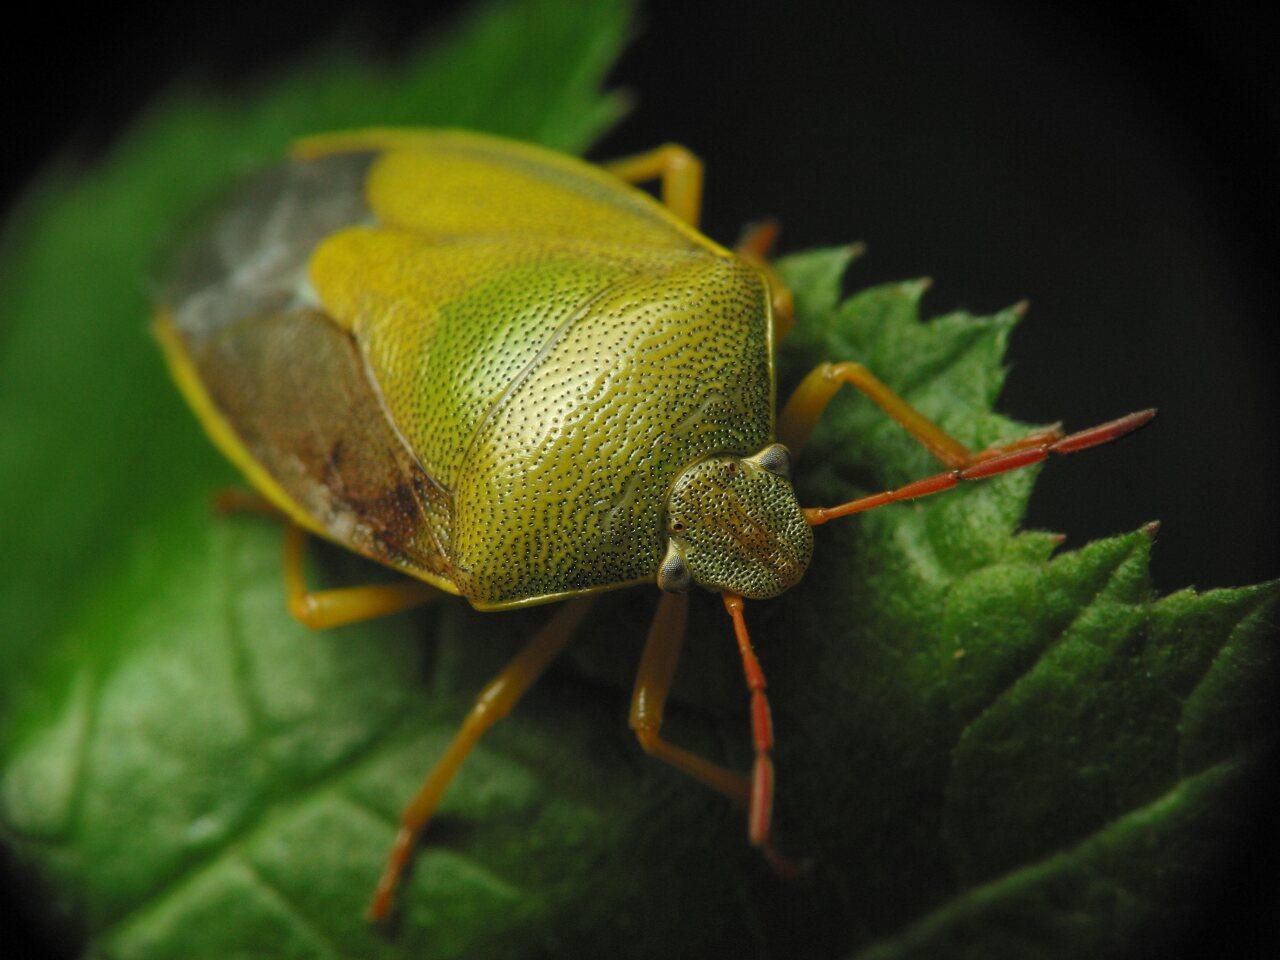 Piezodorus-lituratus-3081.jpg